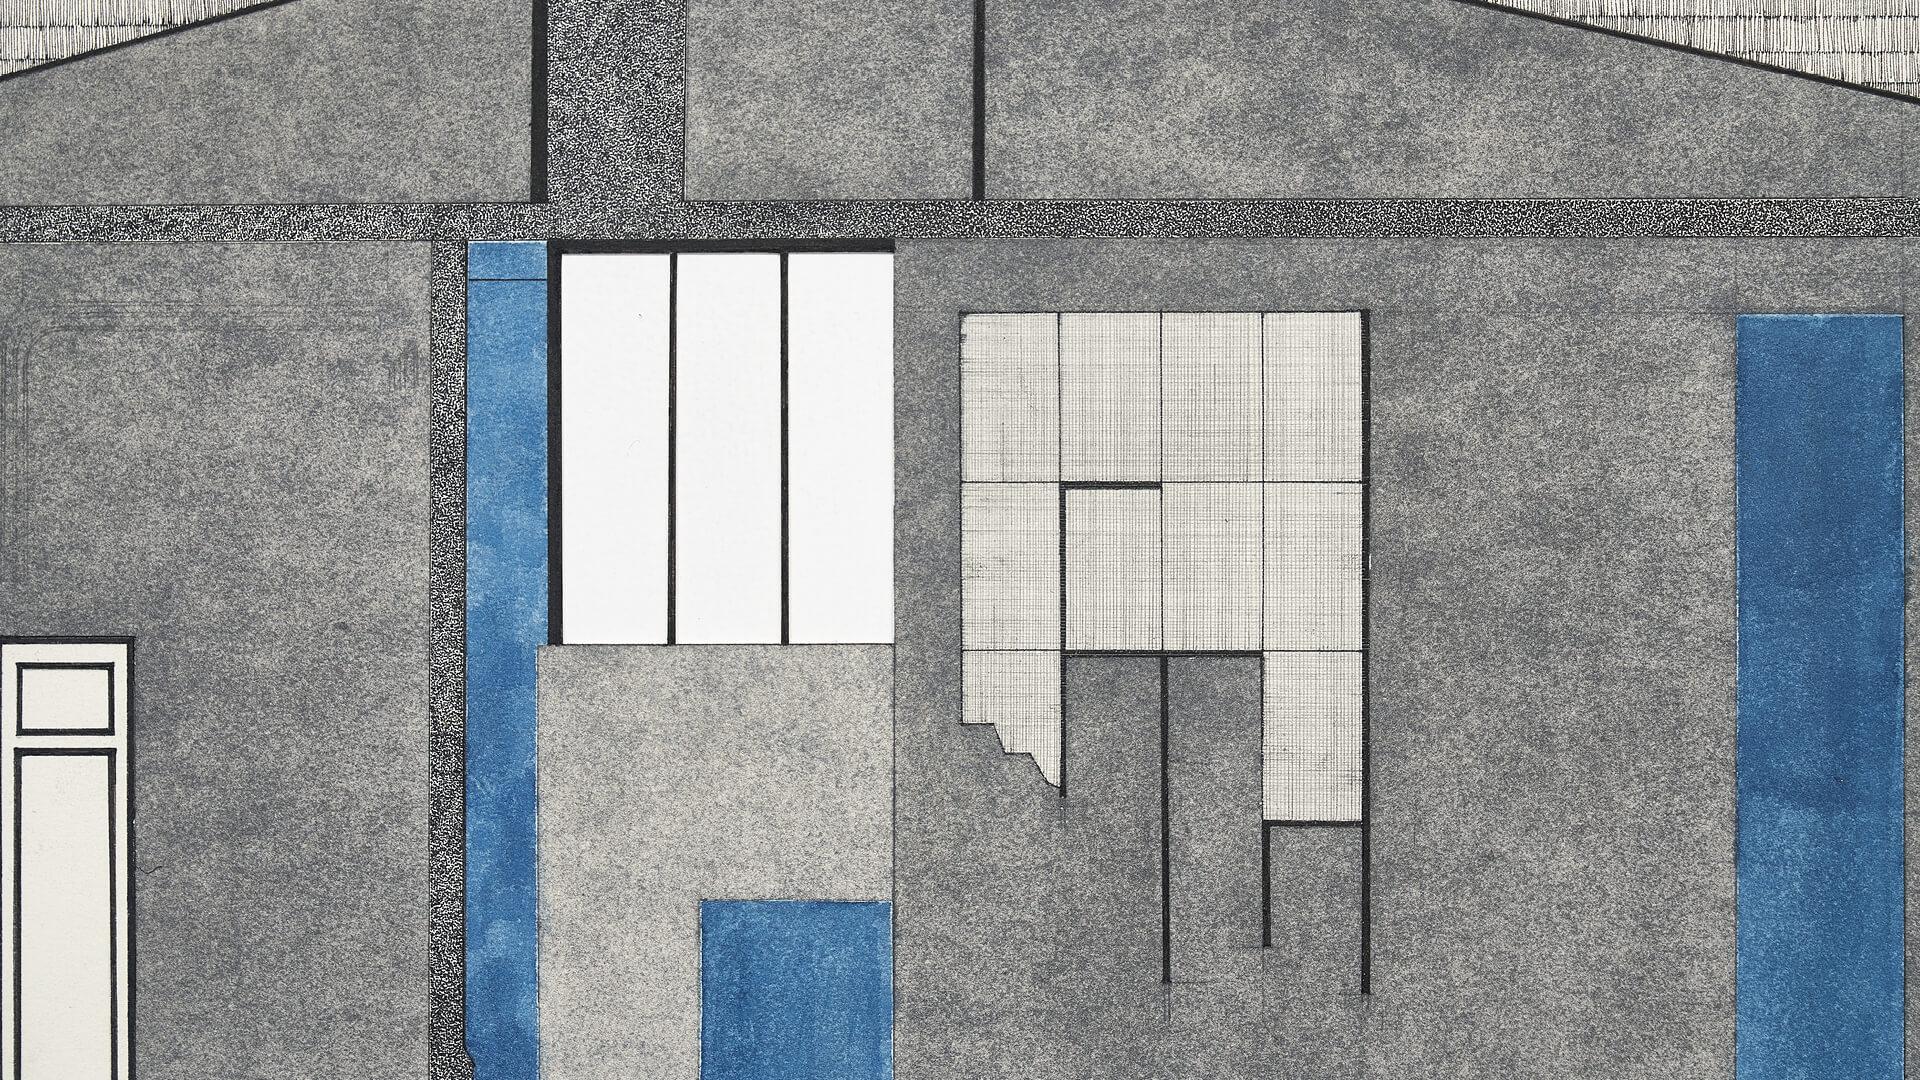 <em>Folly Measures</em> celebrates architecture as an indicator of urban experiences